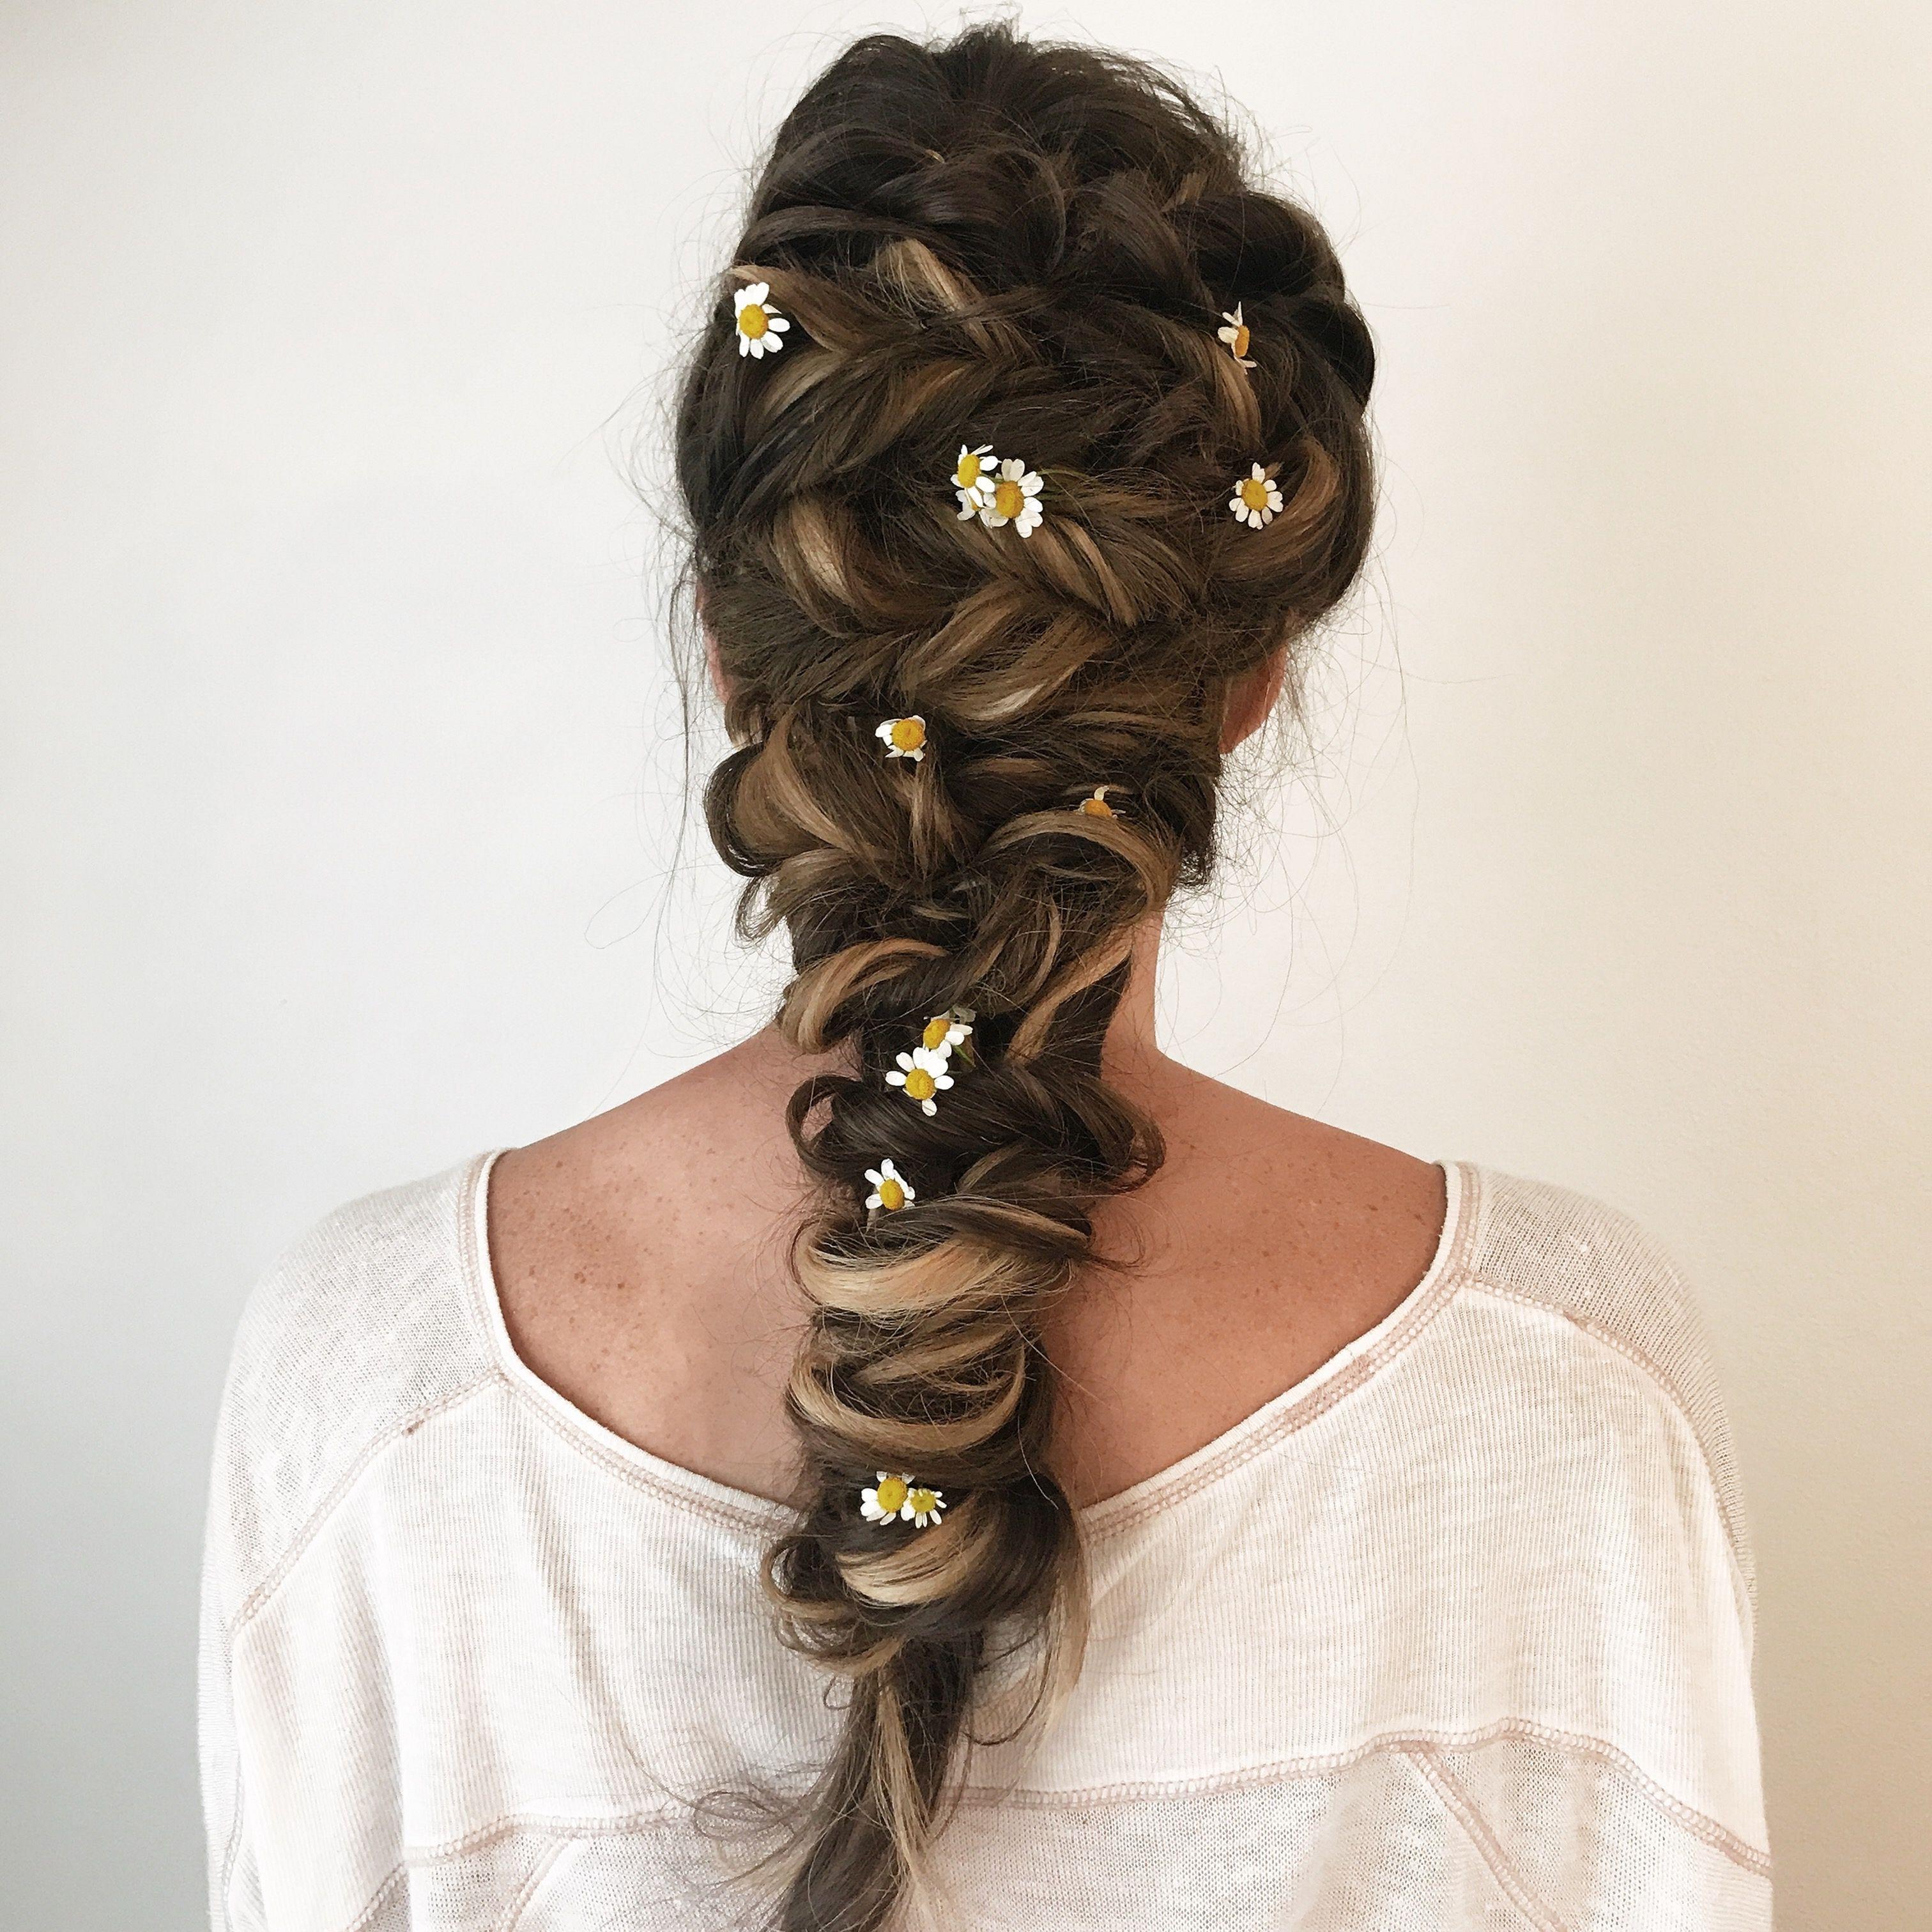 40+ Beautiful Mermaid Braid Hairstyles For Cute Girls (View 1 of 15)